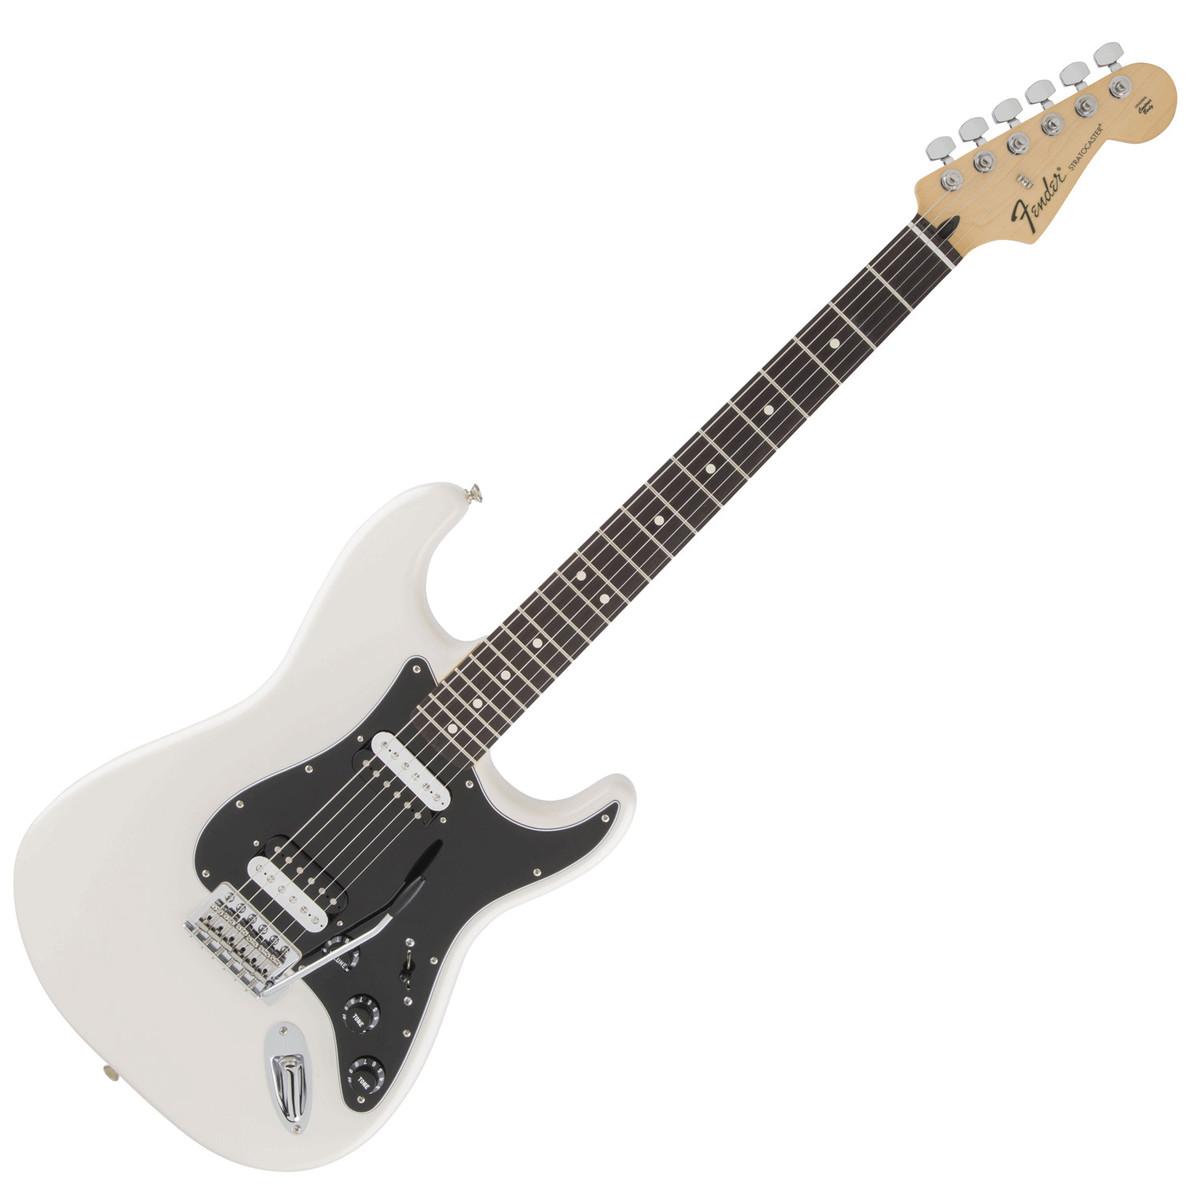 fender standard stratocaster hh olympic white ex demo at gear4music. Black Bedroom Furniture Sets. Home Design Ideas